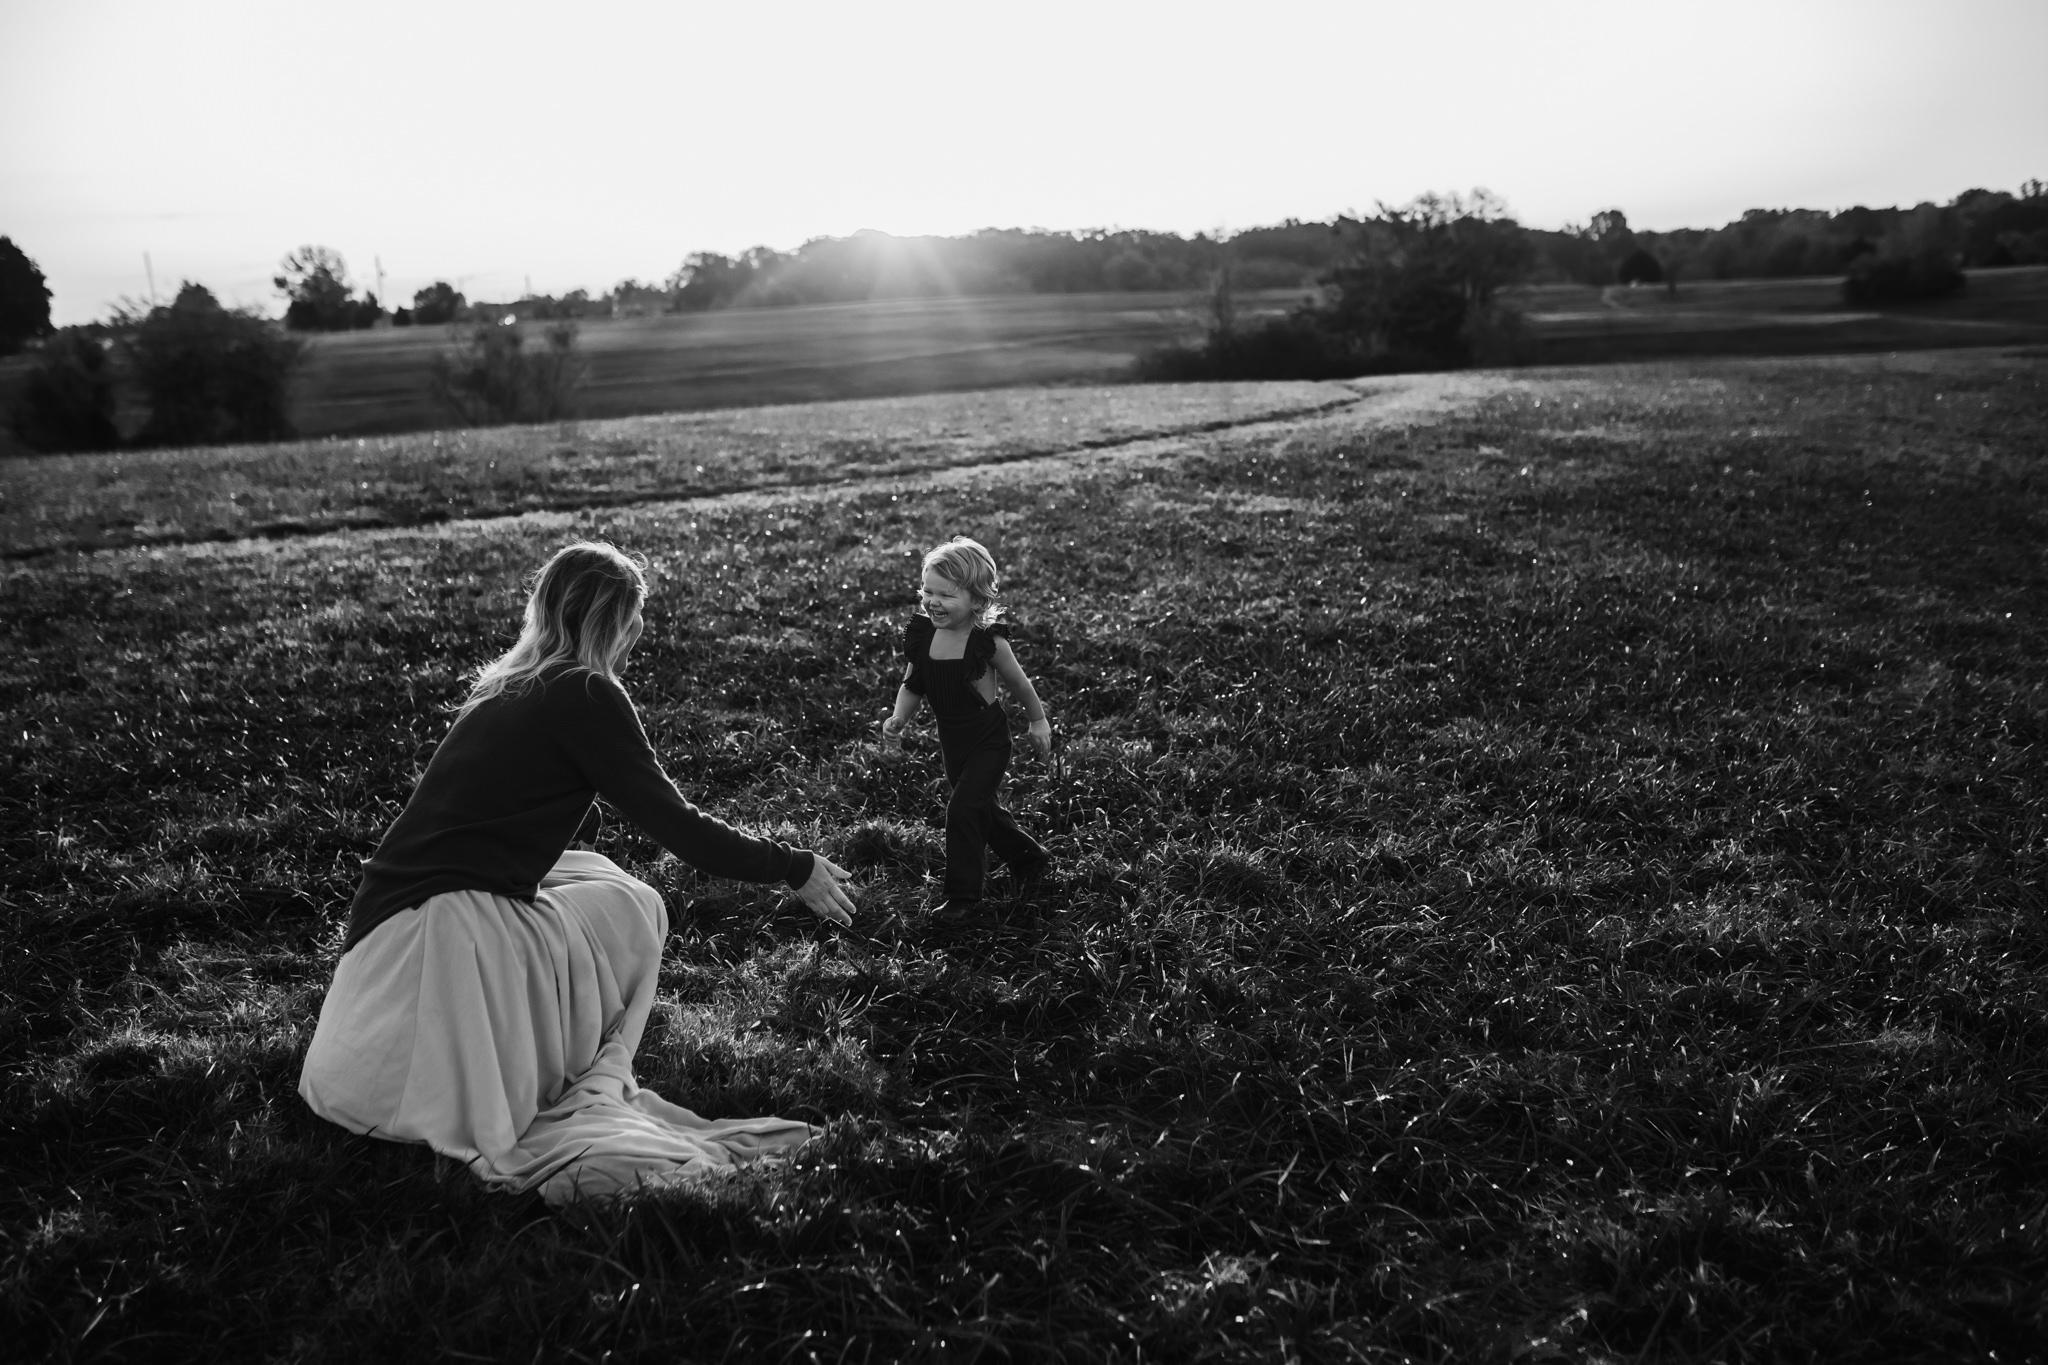 cassie-cook-photography-memphis-family-photographer-lifestyle-family-photographer-sunrise-gray-family-24.jpg